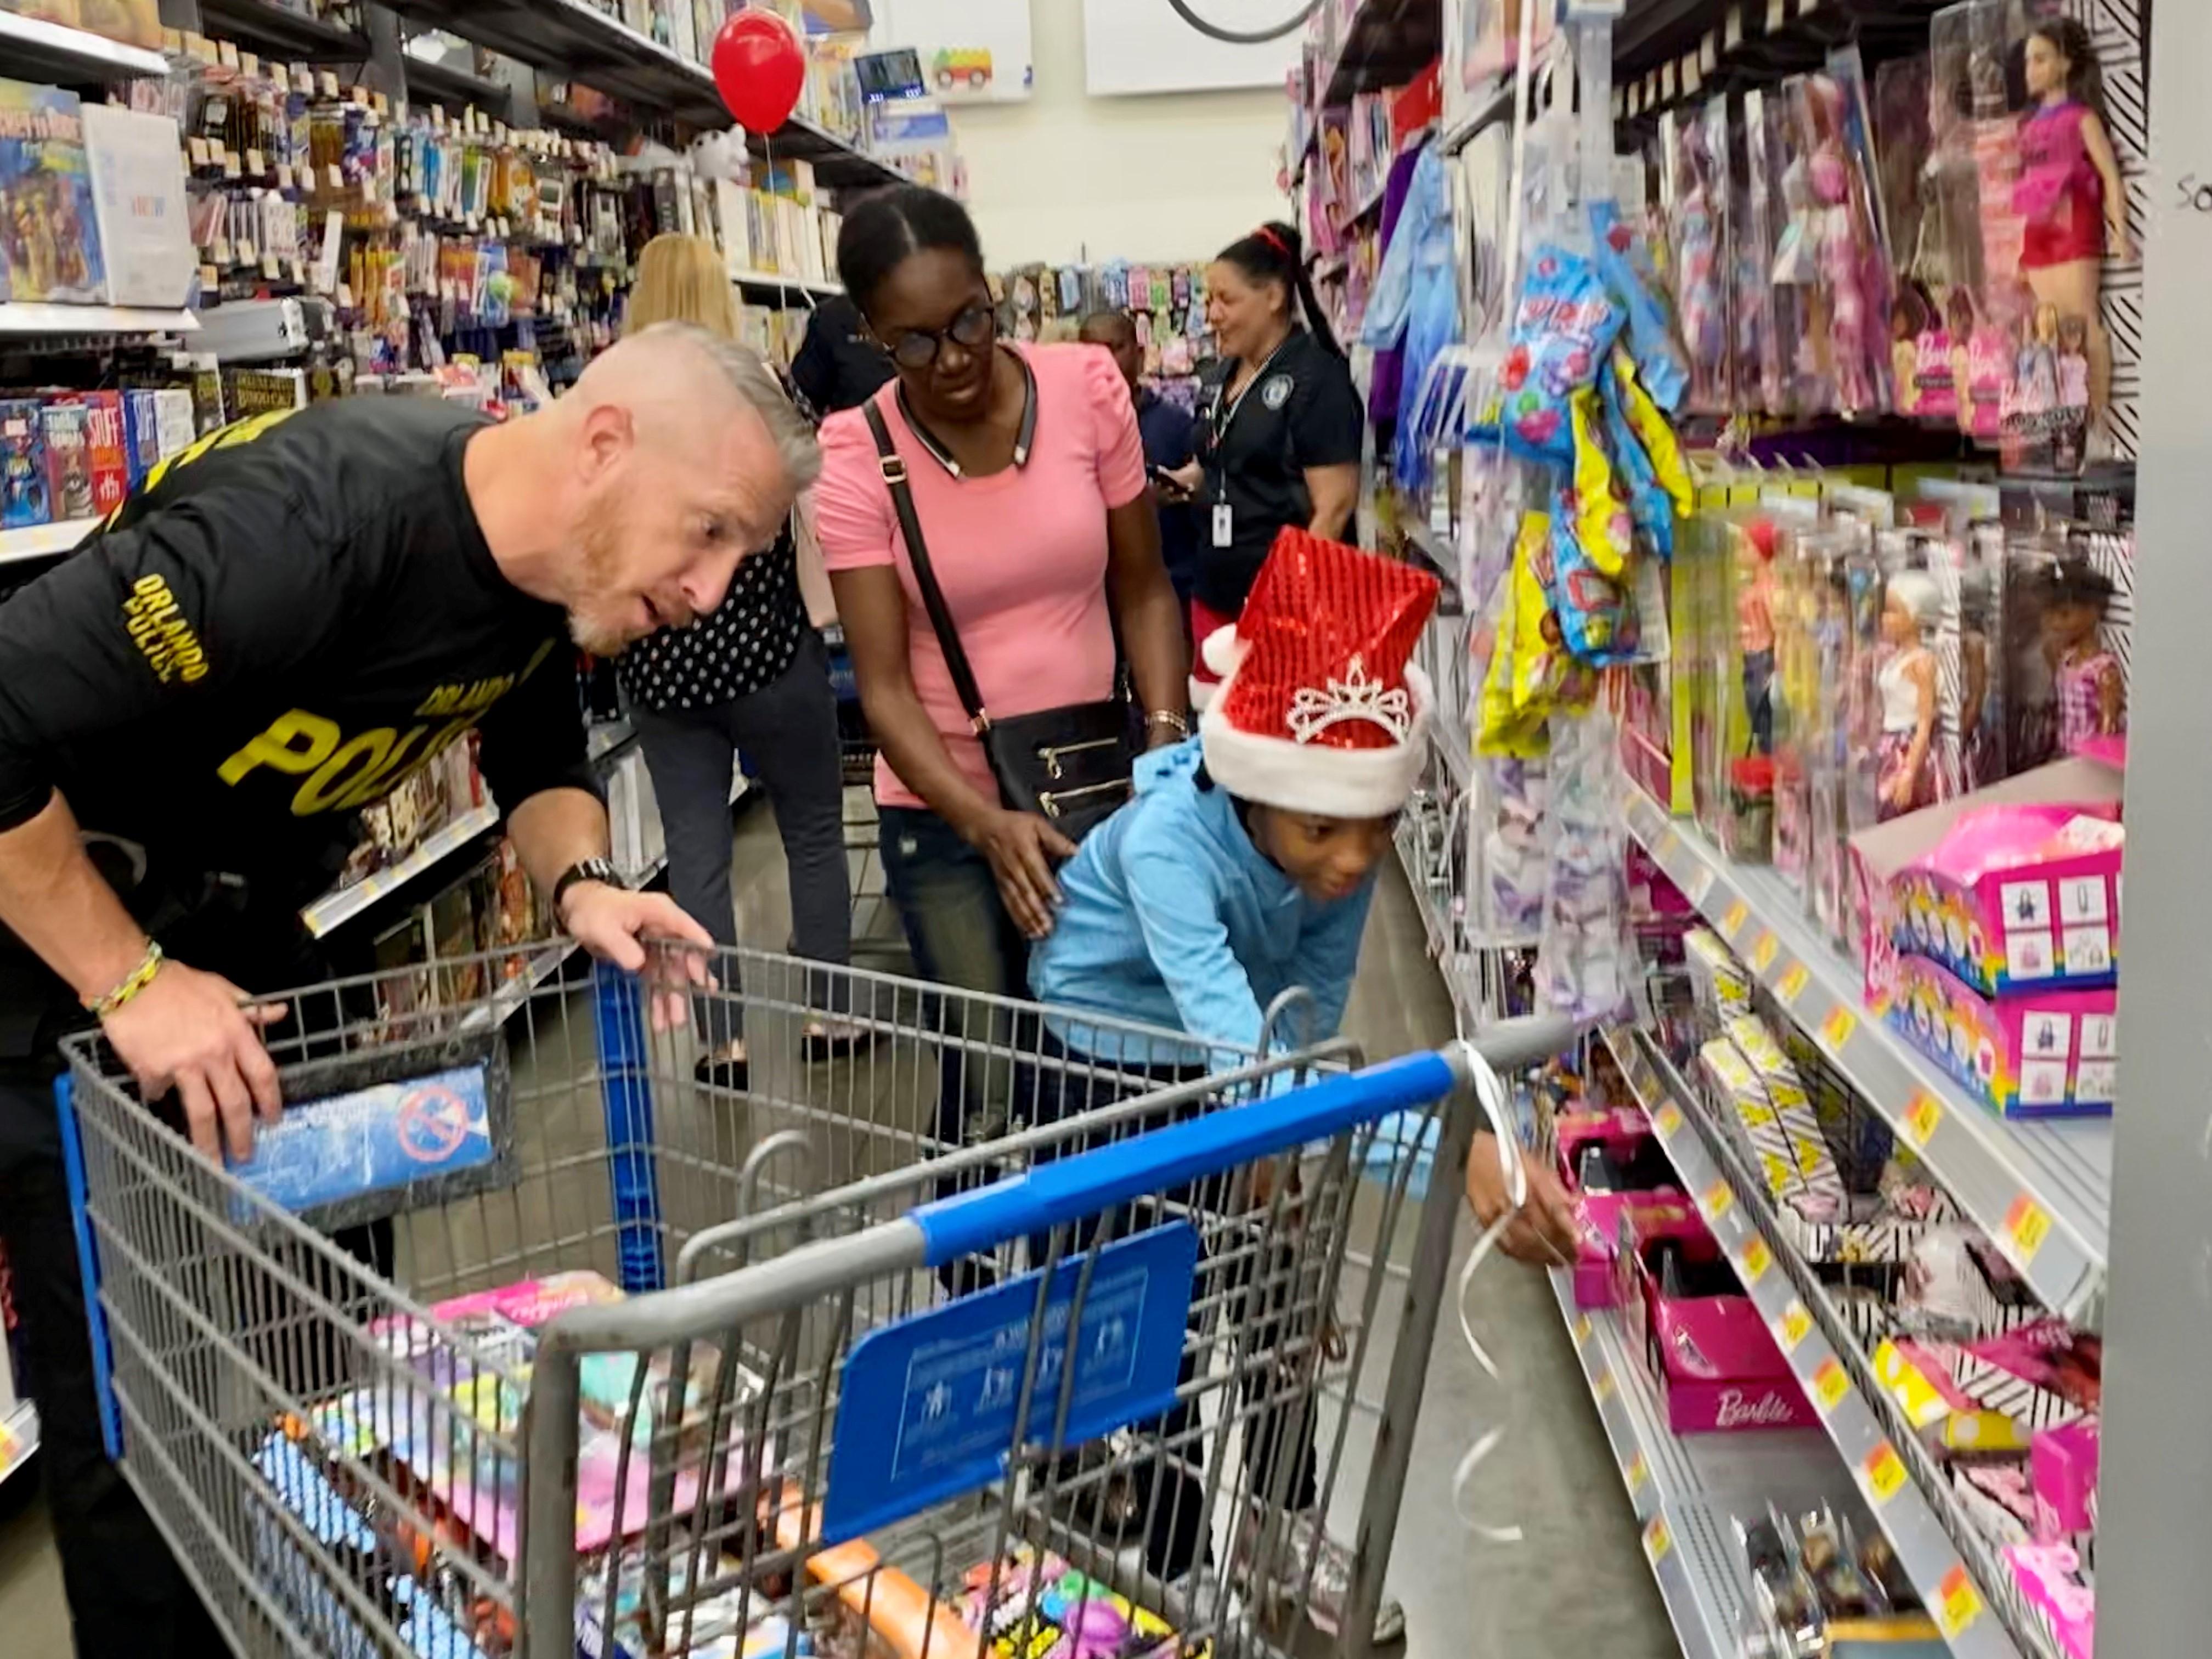 Dozens of kids Shop with a Super Cop in Orlando Walmarts